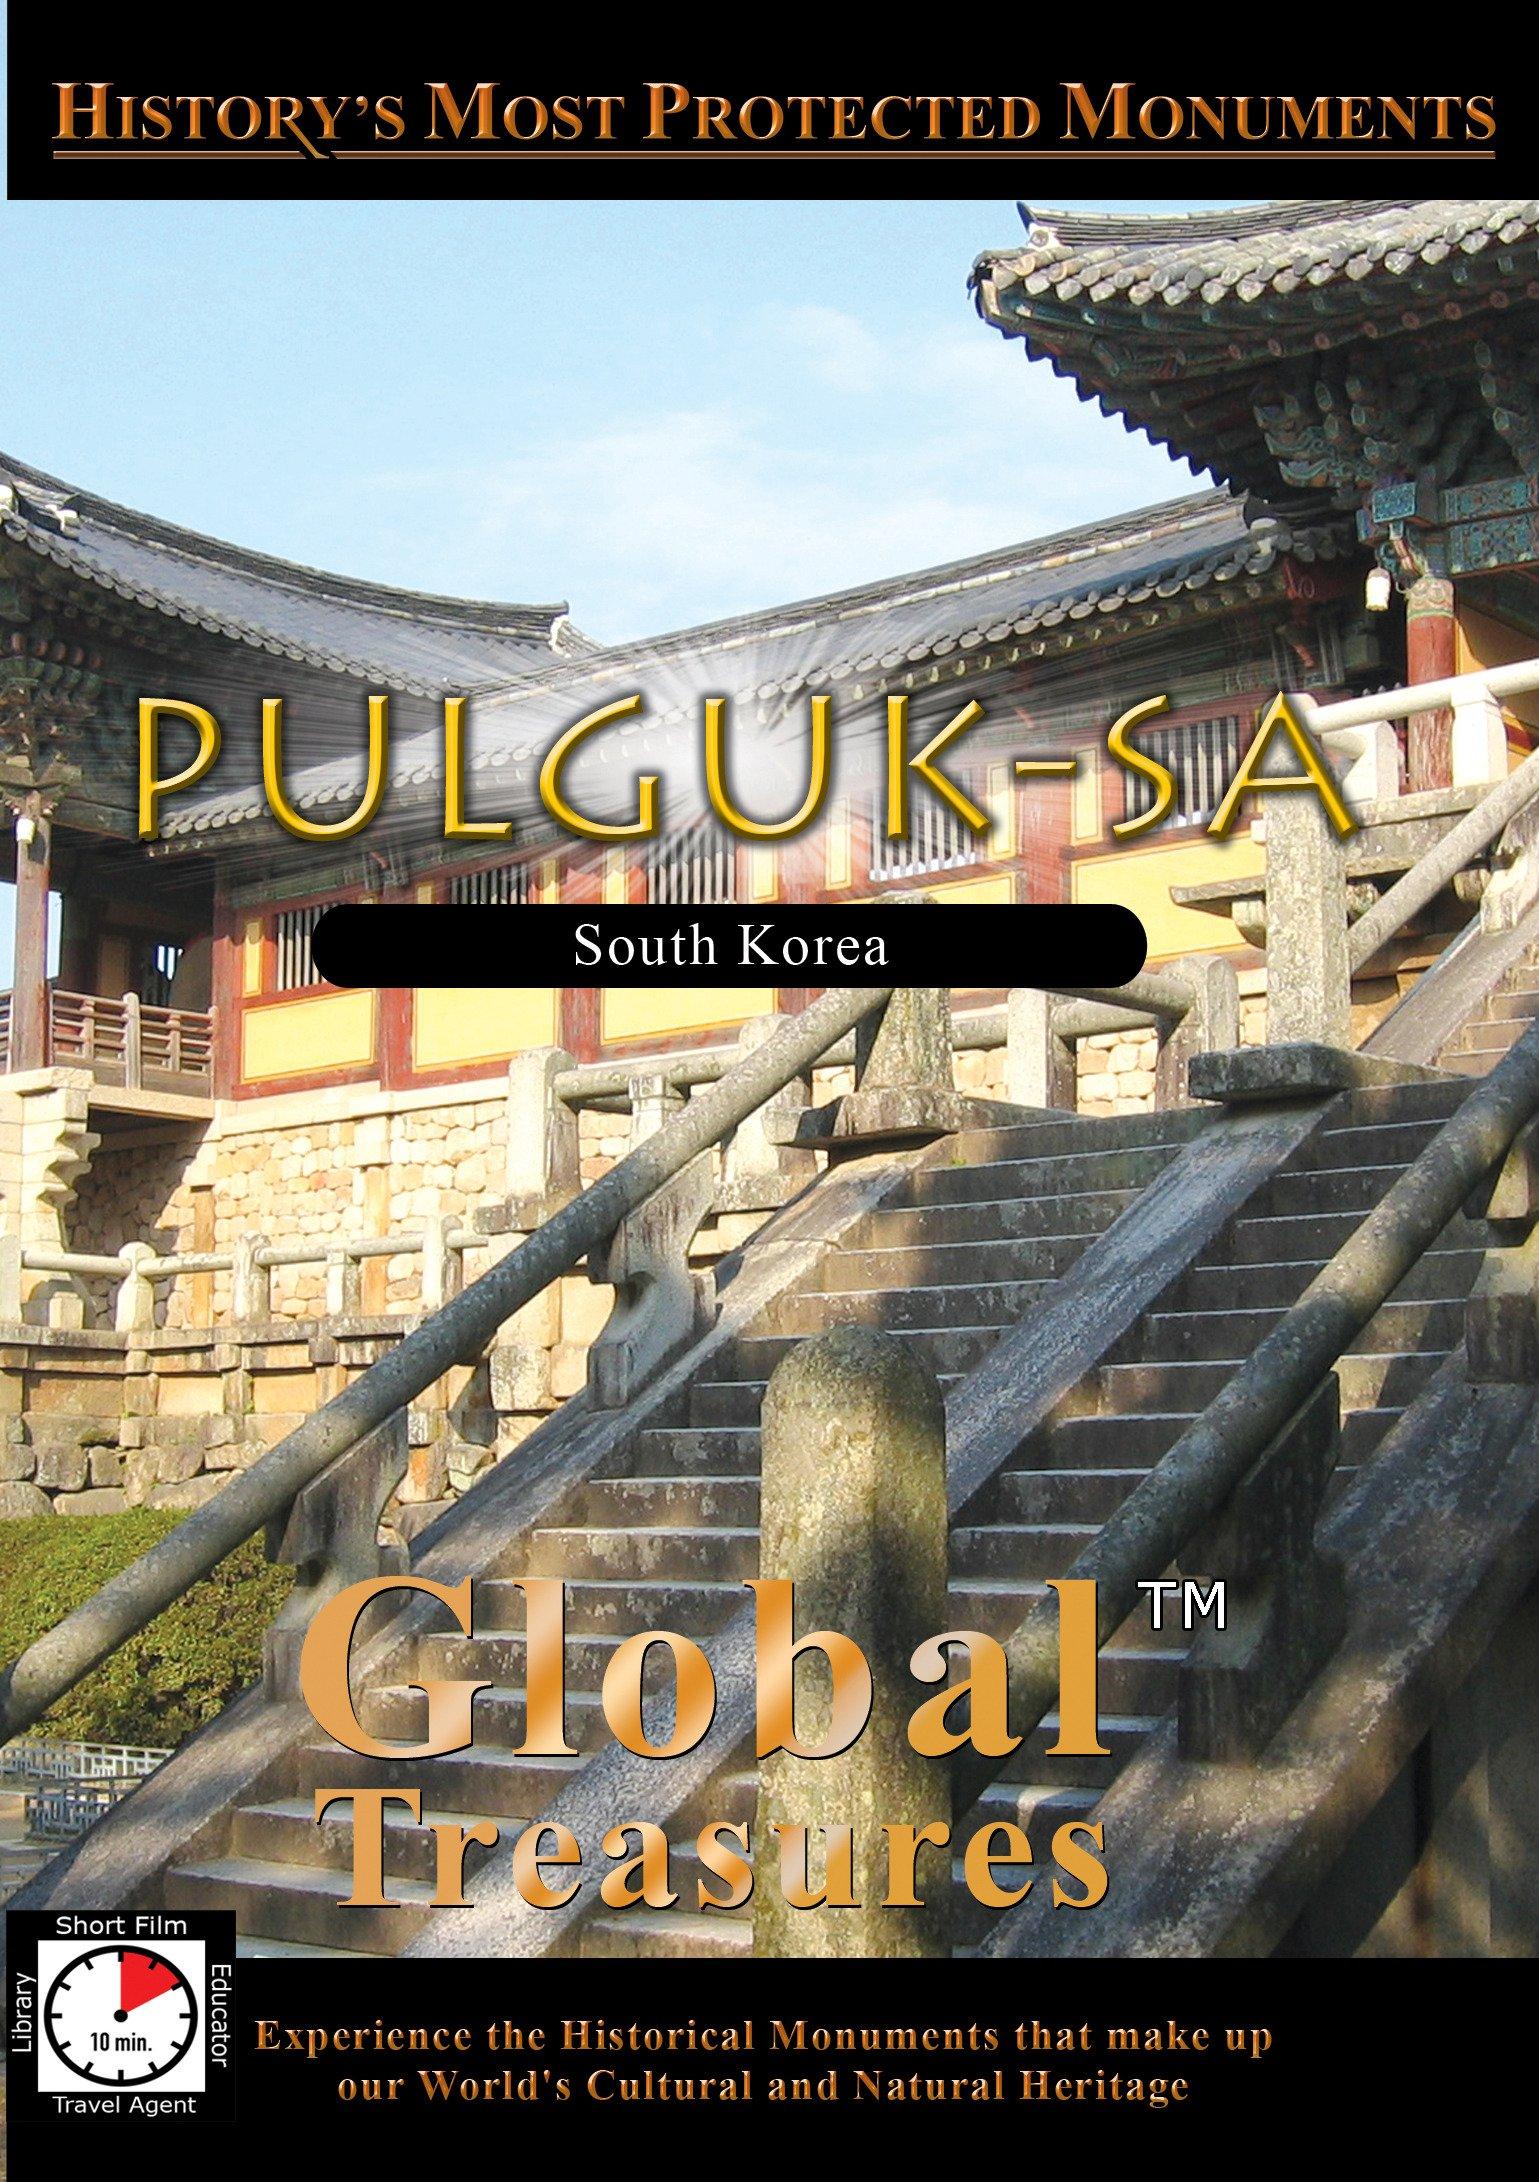 Amazon.com: Watch Global Treasures - Pulguk-Sa, South Korea | Prime Video